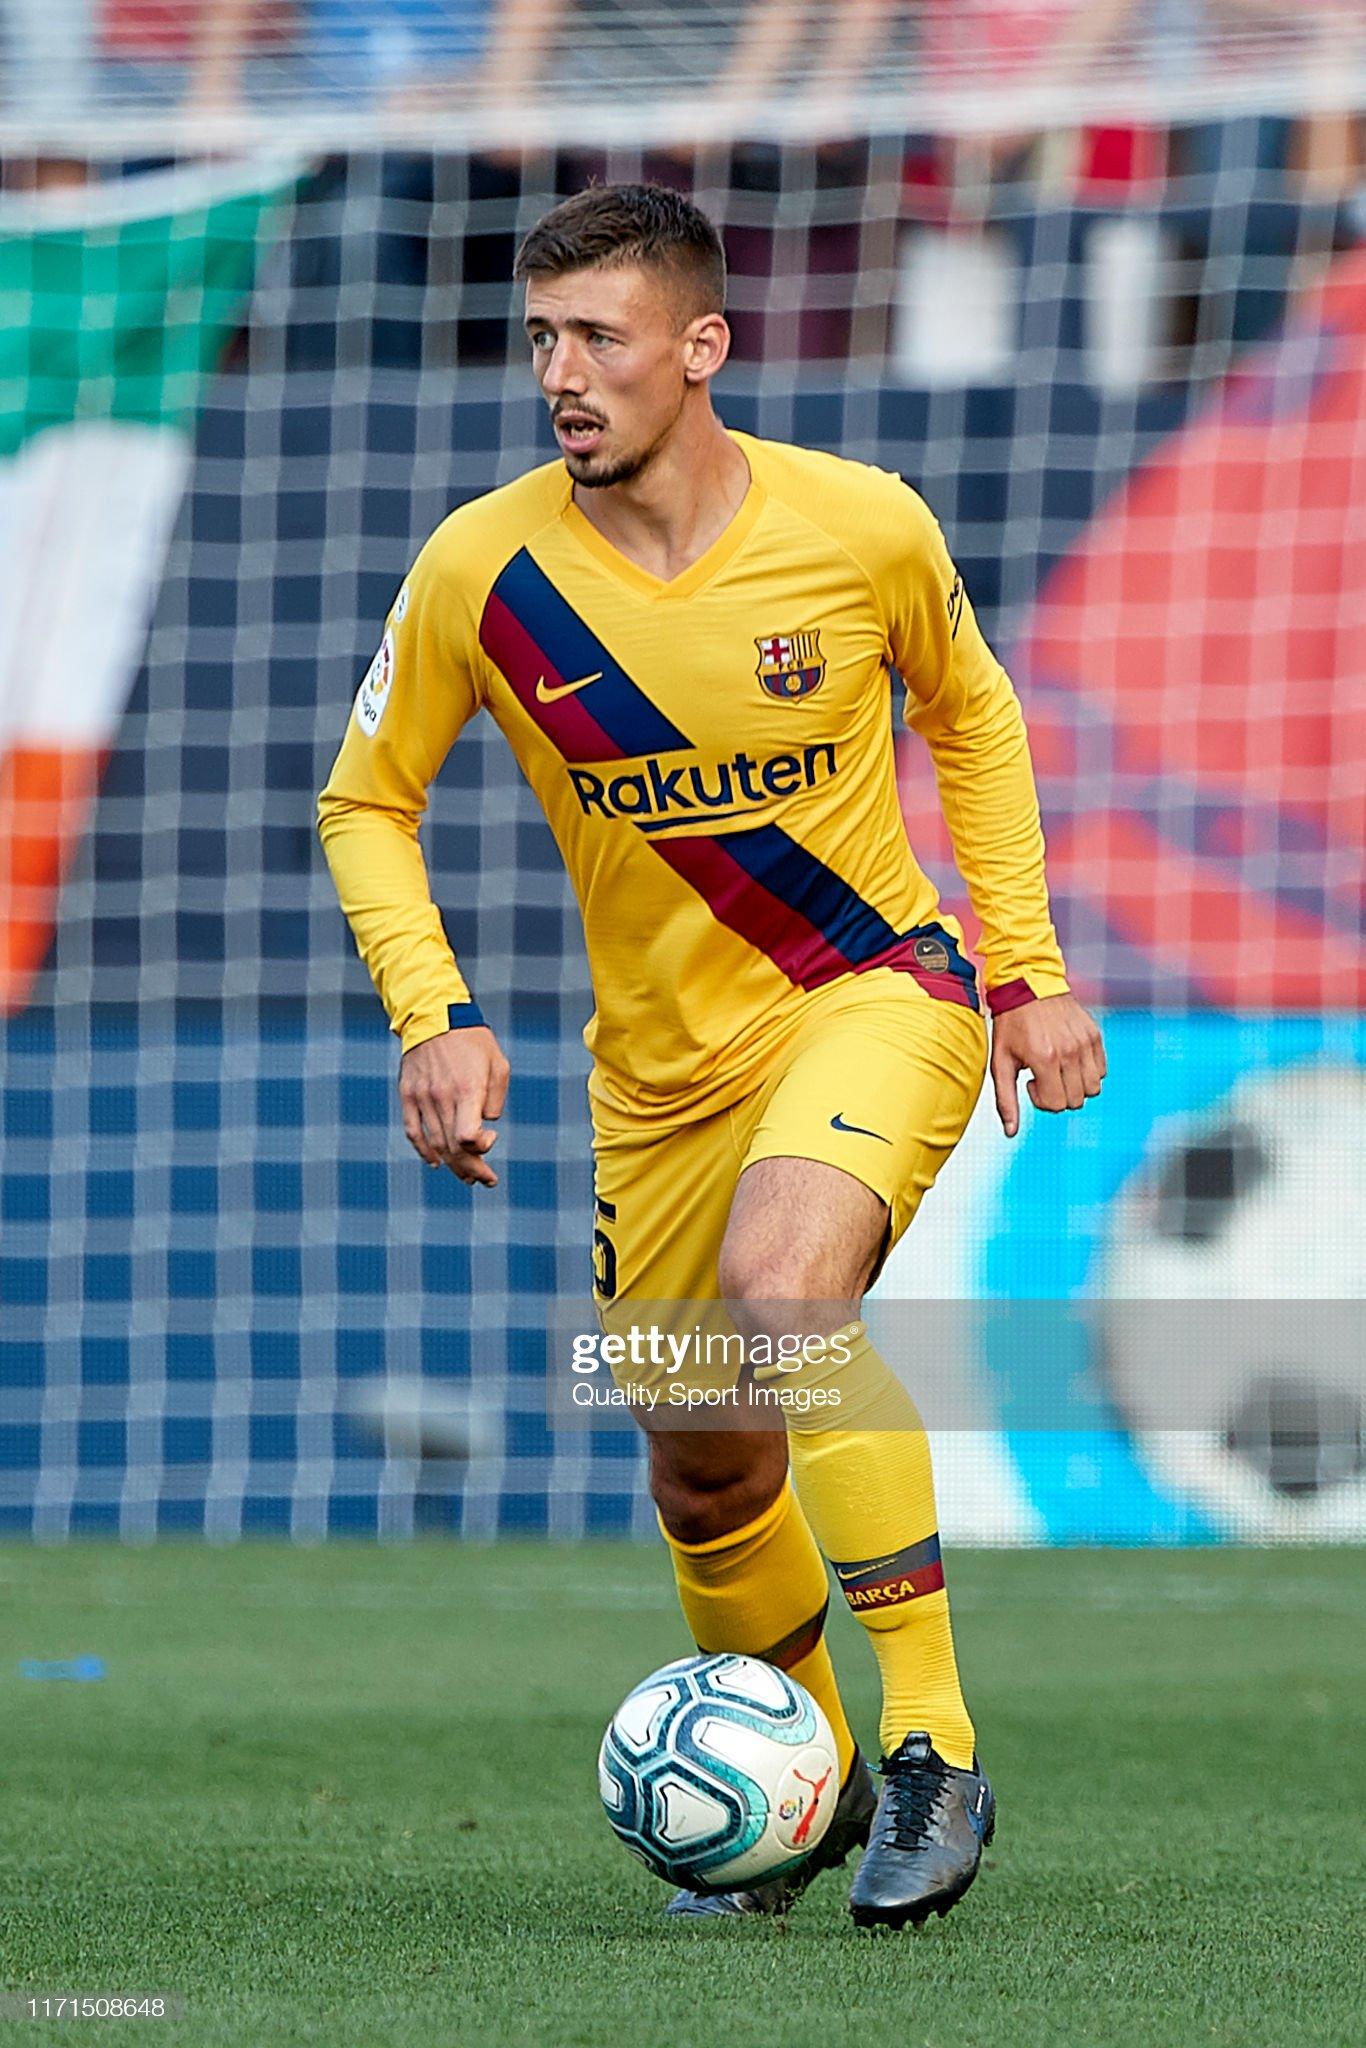 صور مباراة : أوساسونا - برشلونة 2-2 ( 31-08-2019 )  Clement-lenglet-of-fc-barcelona-with-the-ball-during-the-liga-match-picture-id1171508648?s=2048x2048